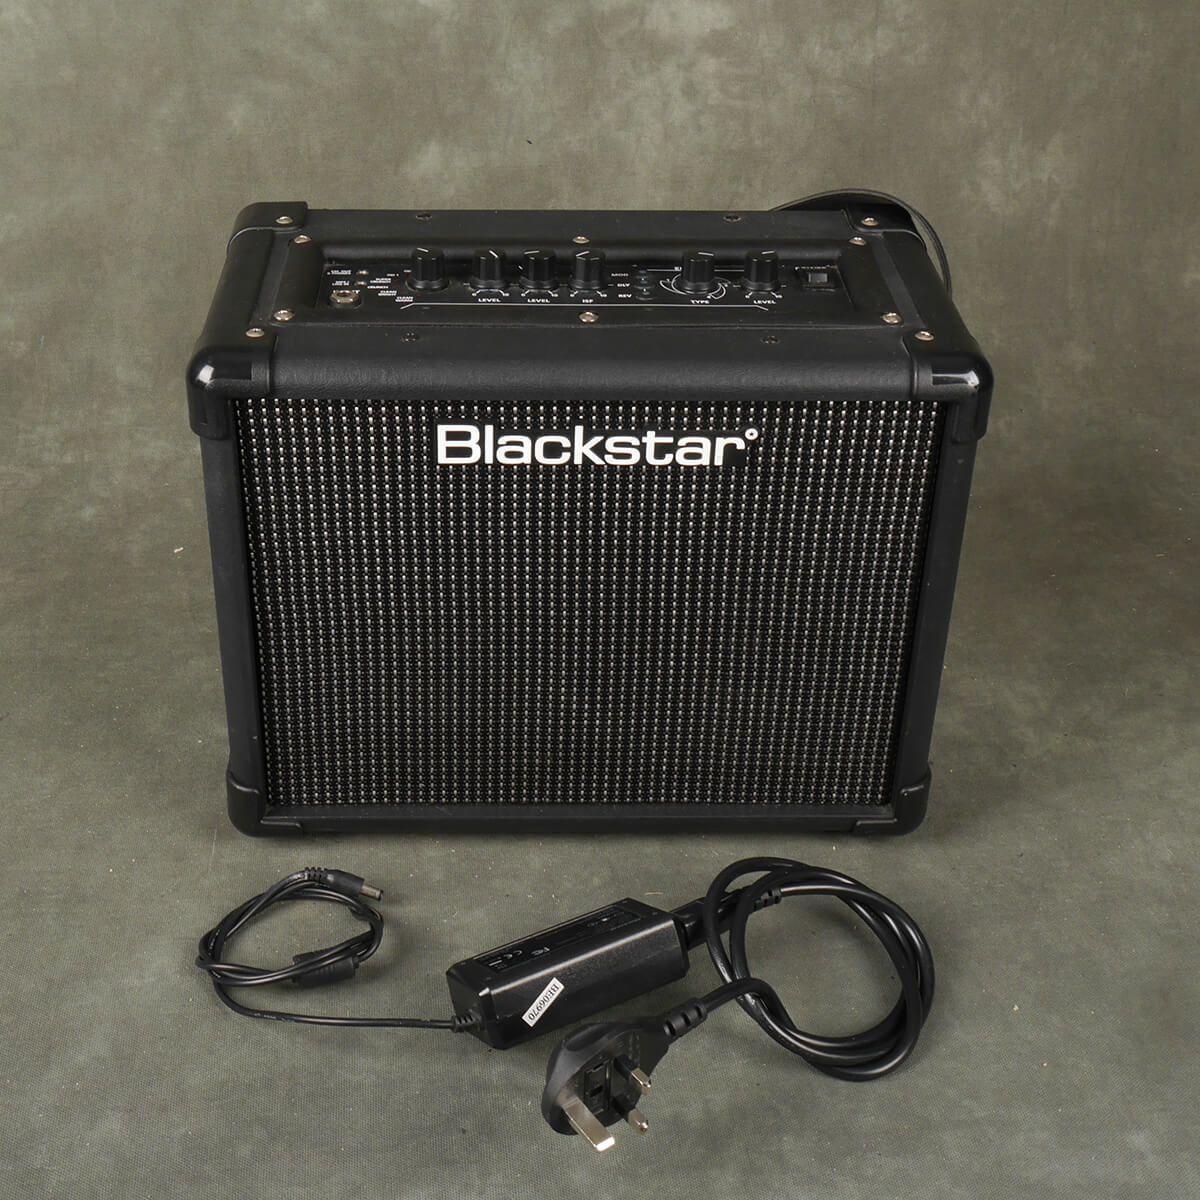 Blackstar IDCore Stereo 10 Combo Amplifier - 2nd Hand